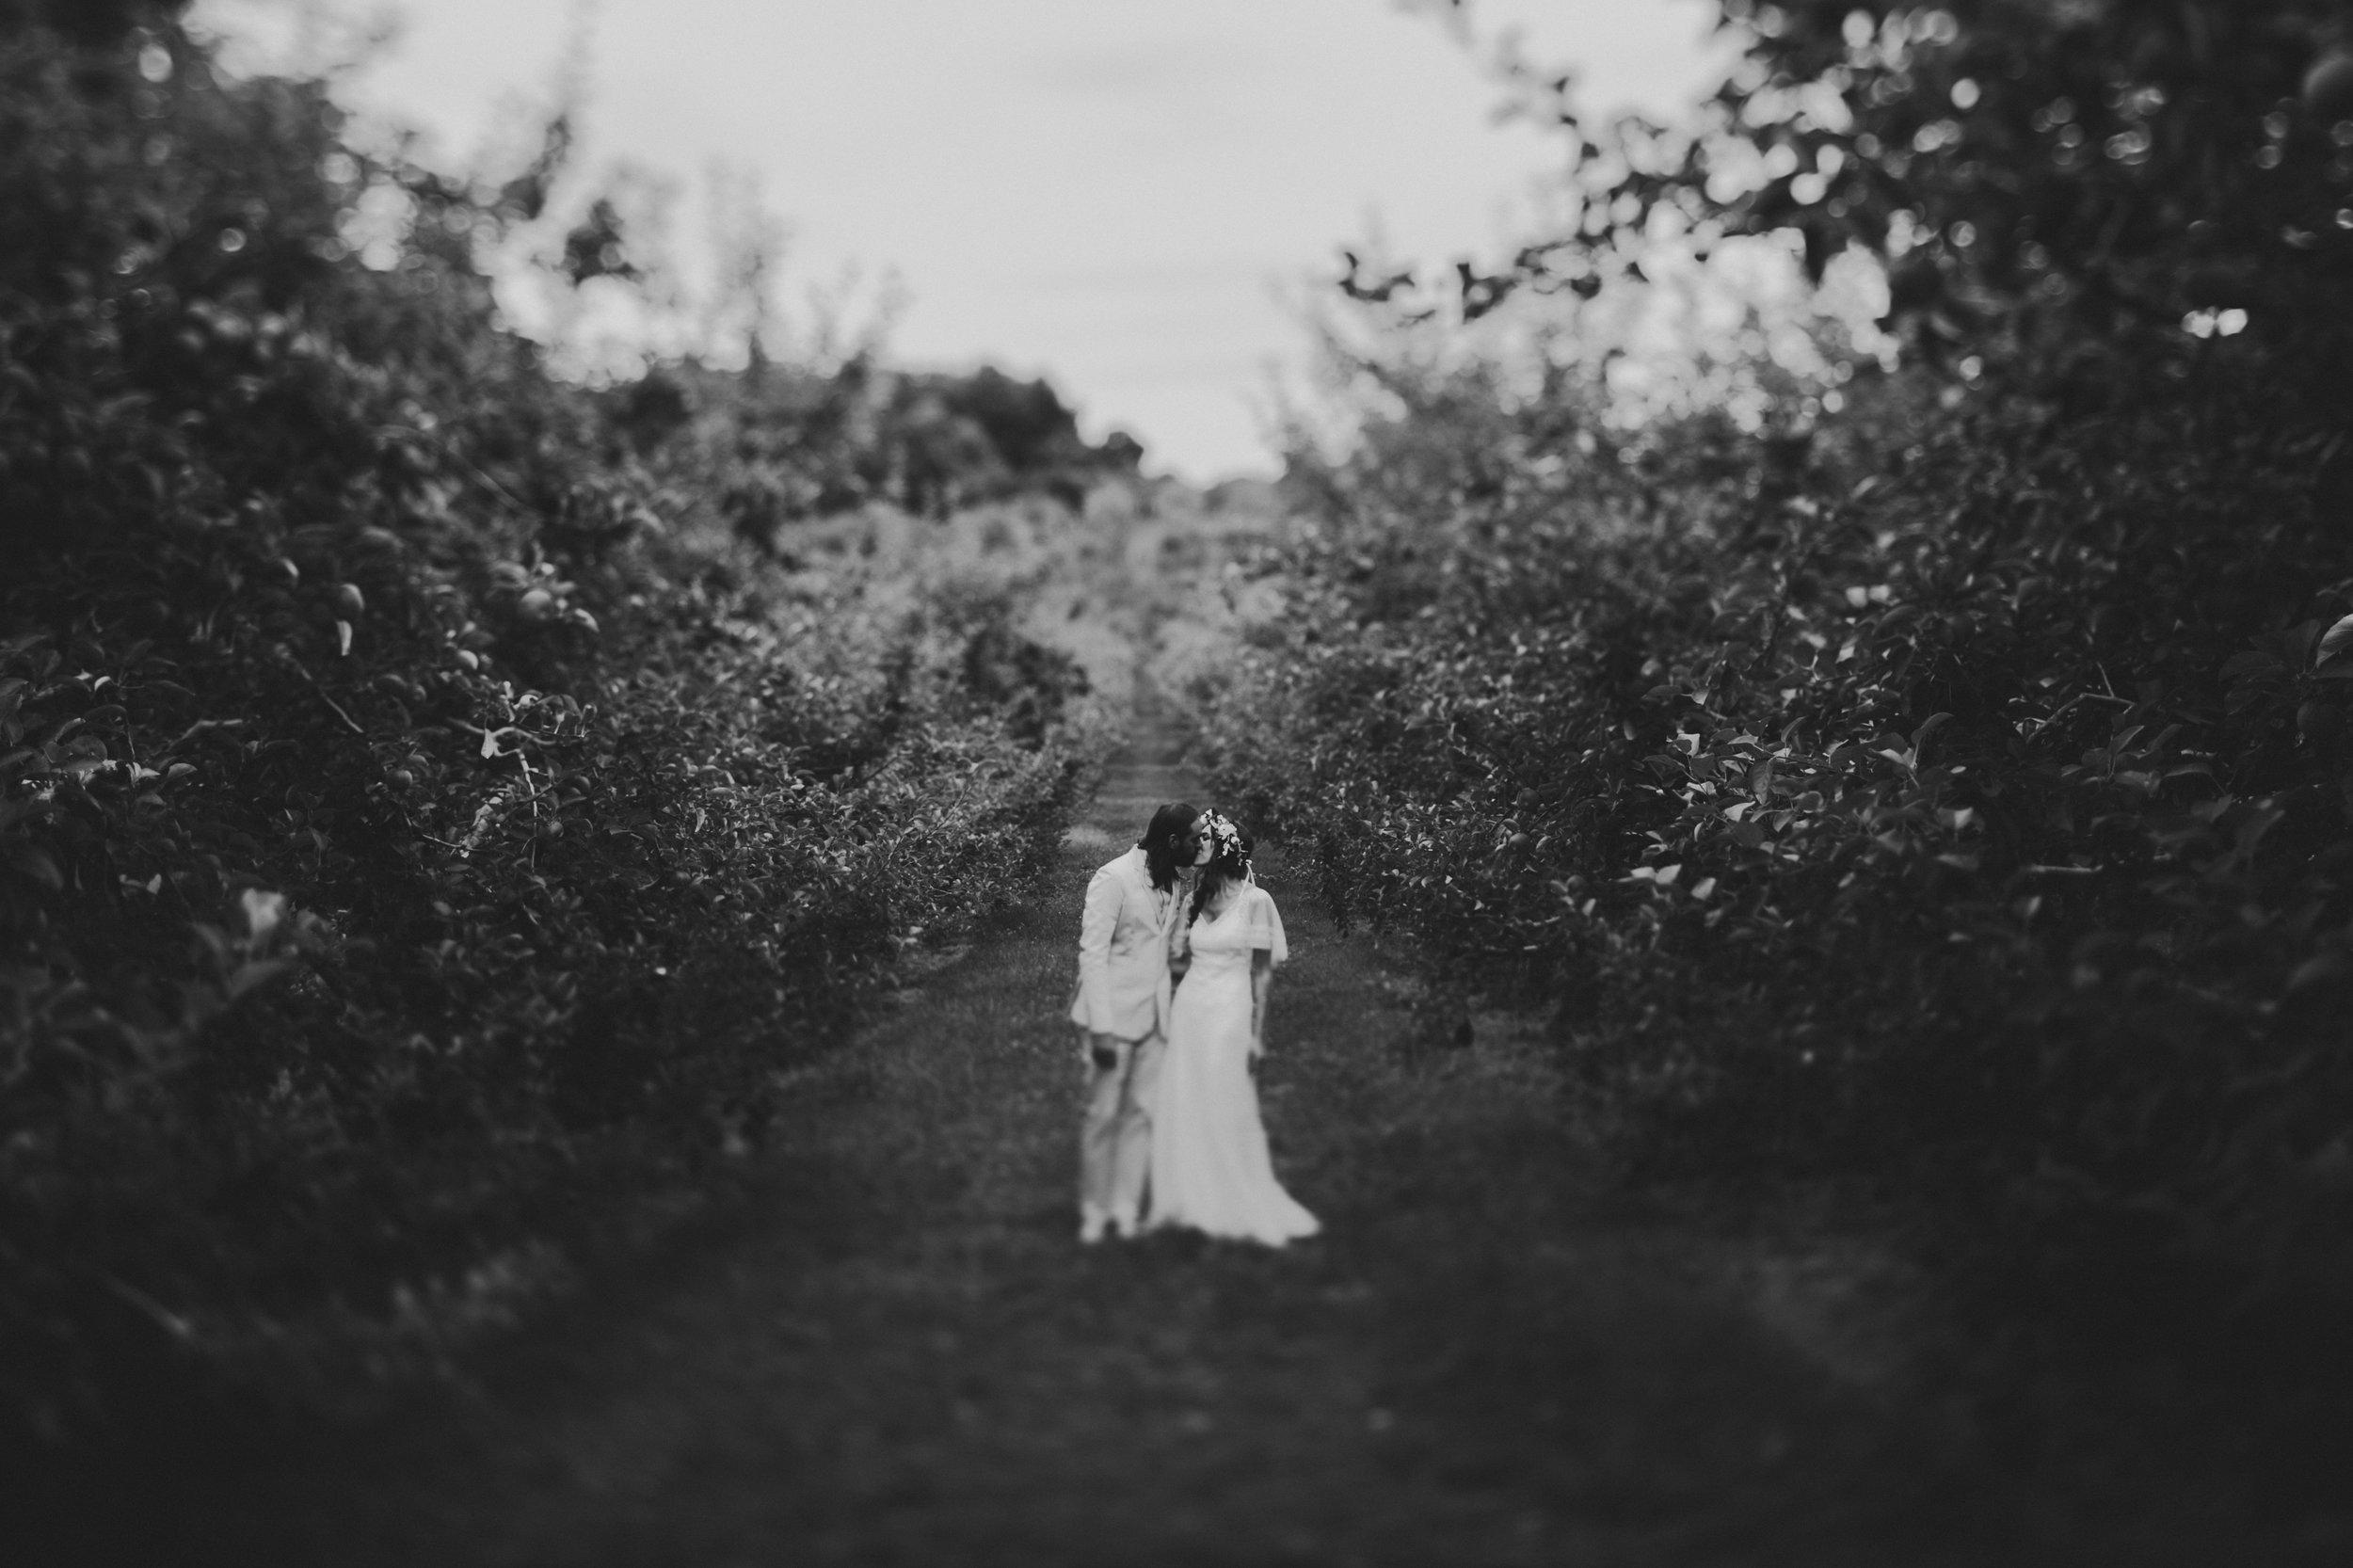 LIBERTY_VIEW_FARM_HIGHLAND_NY_WEDDING_CHELLISE_MICHAEL_PHOTOGRAPHY796.JPG